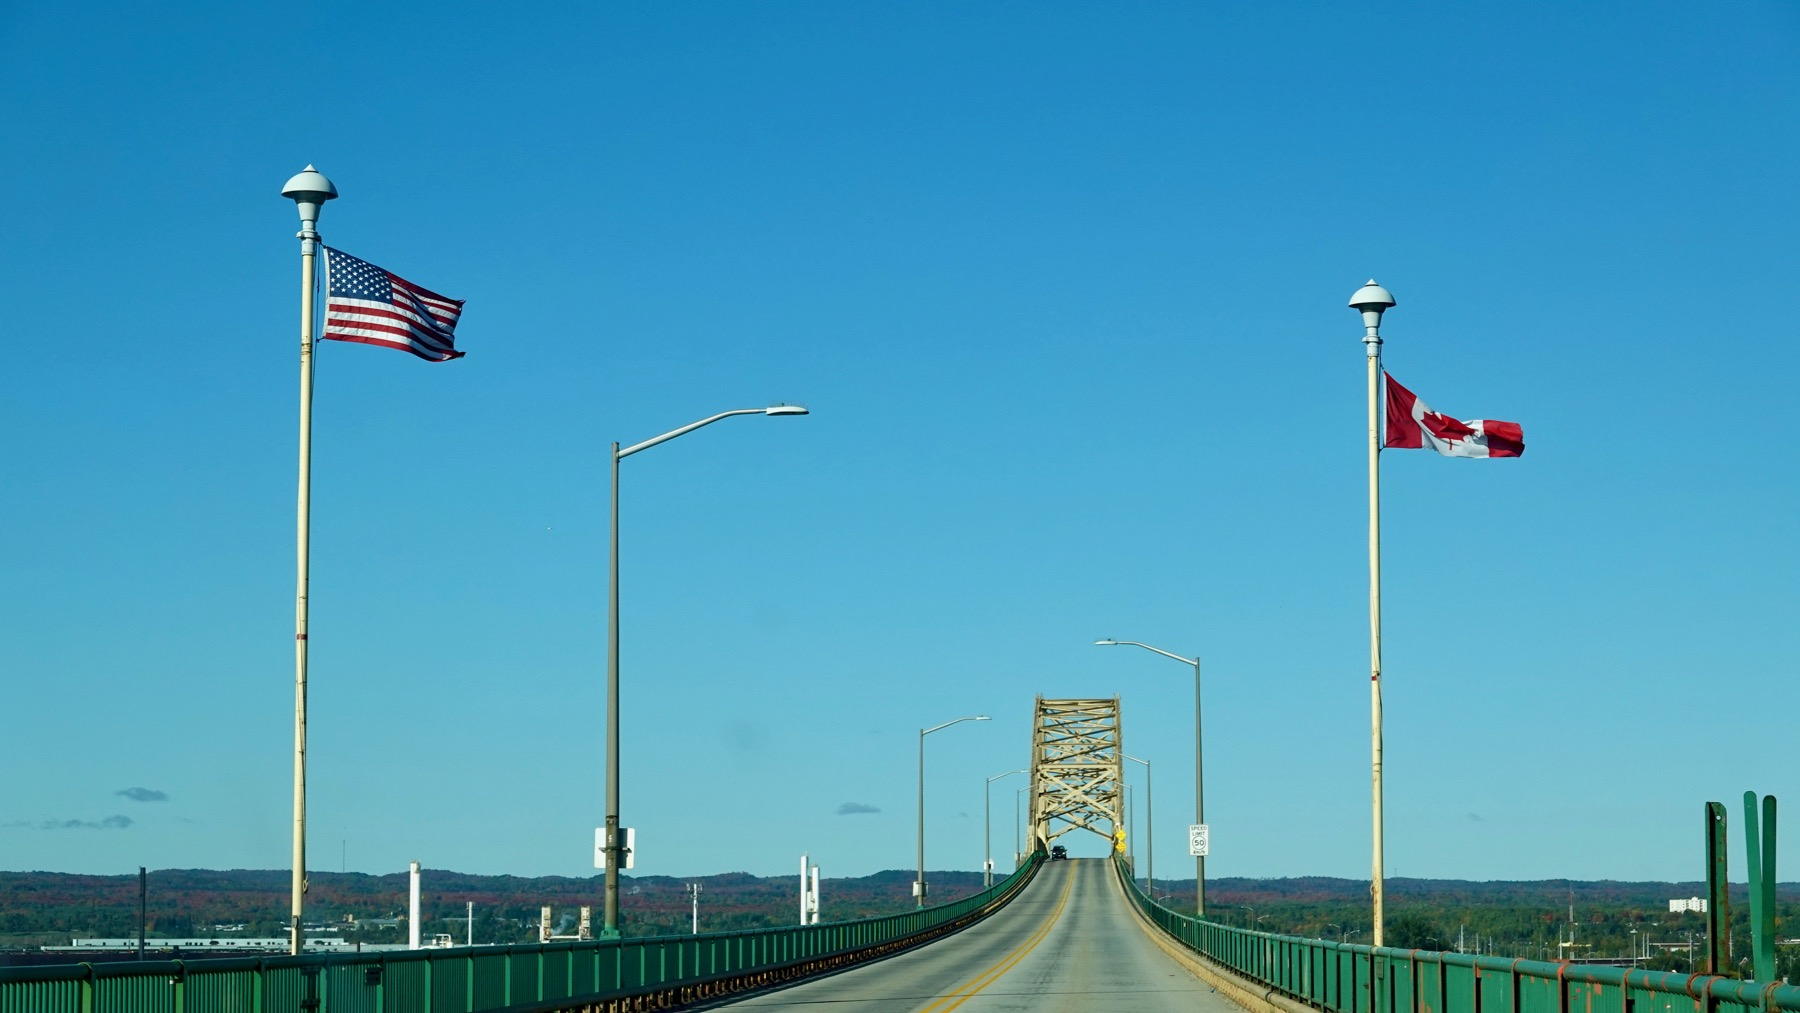 Flags on bridge